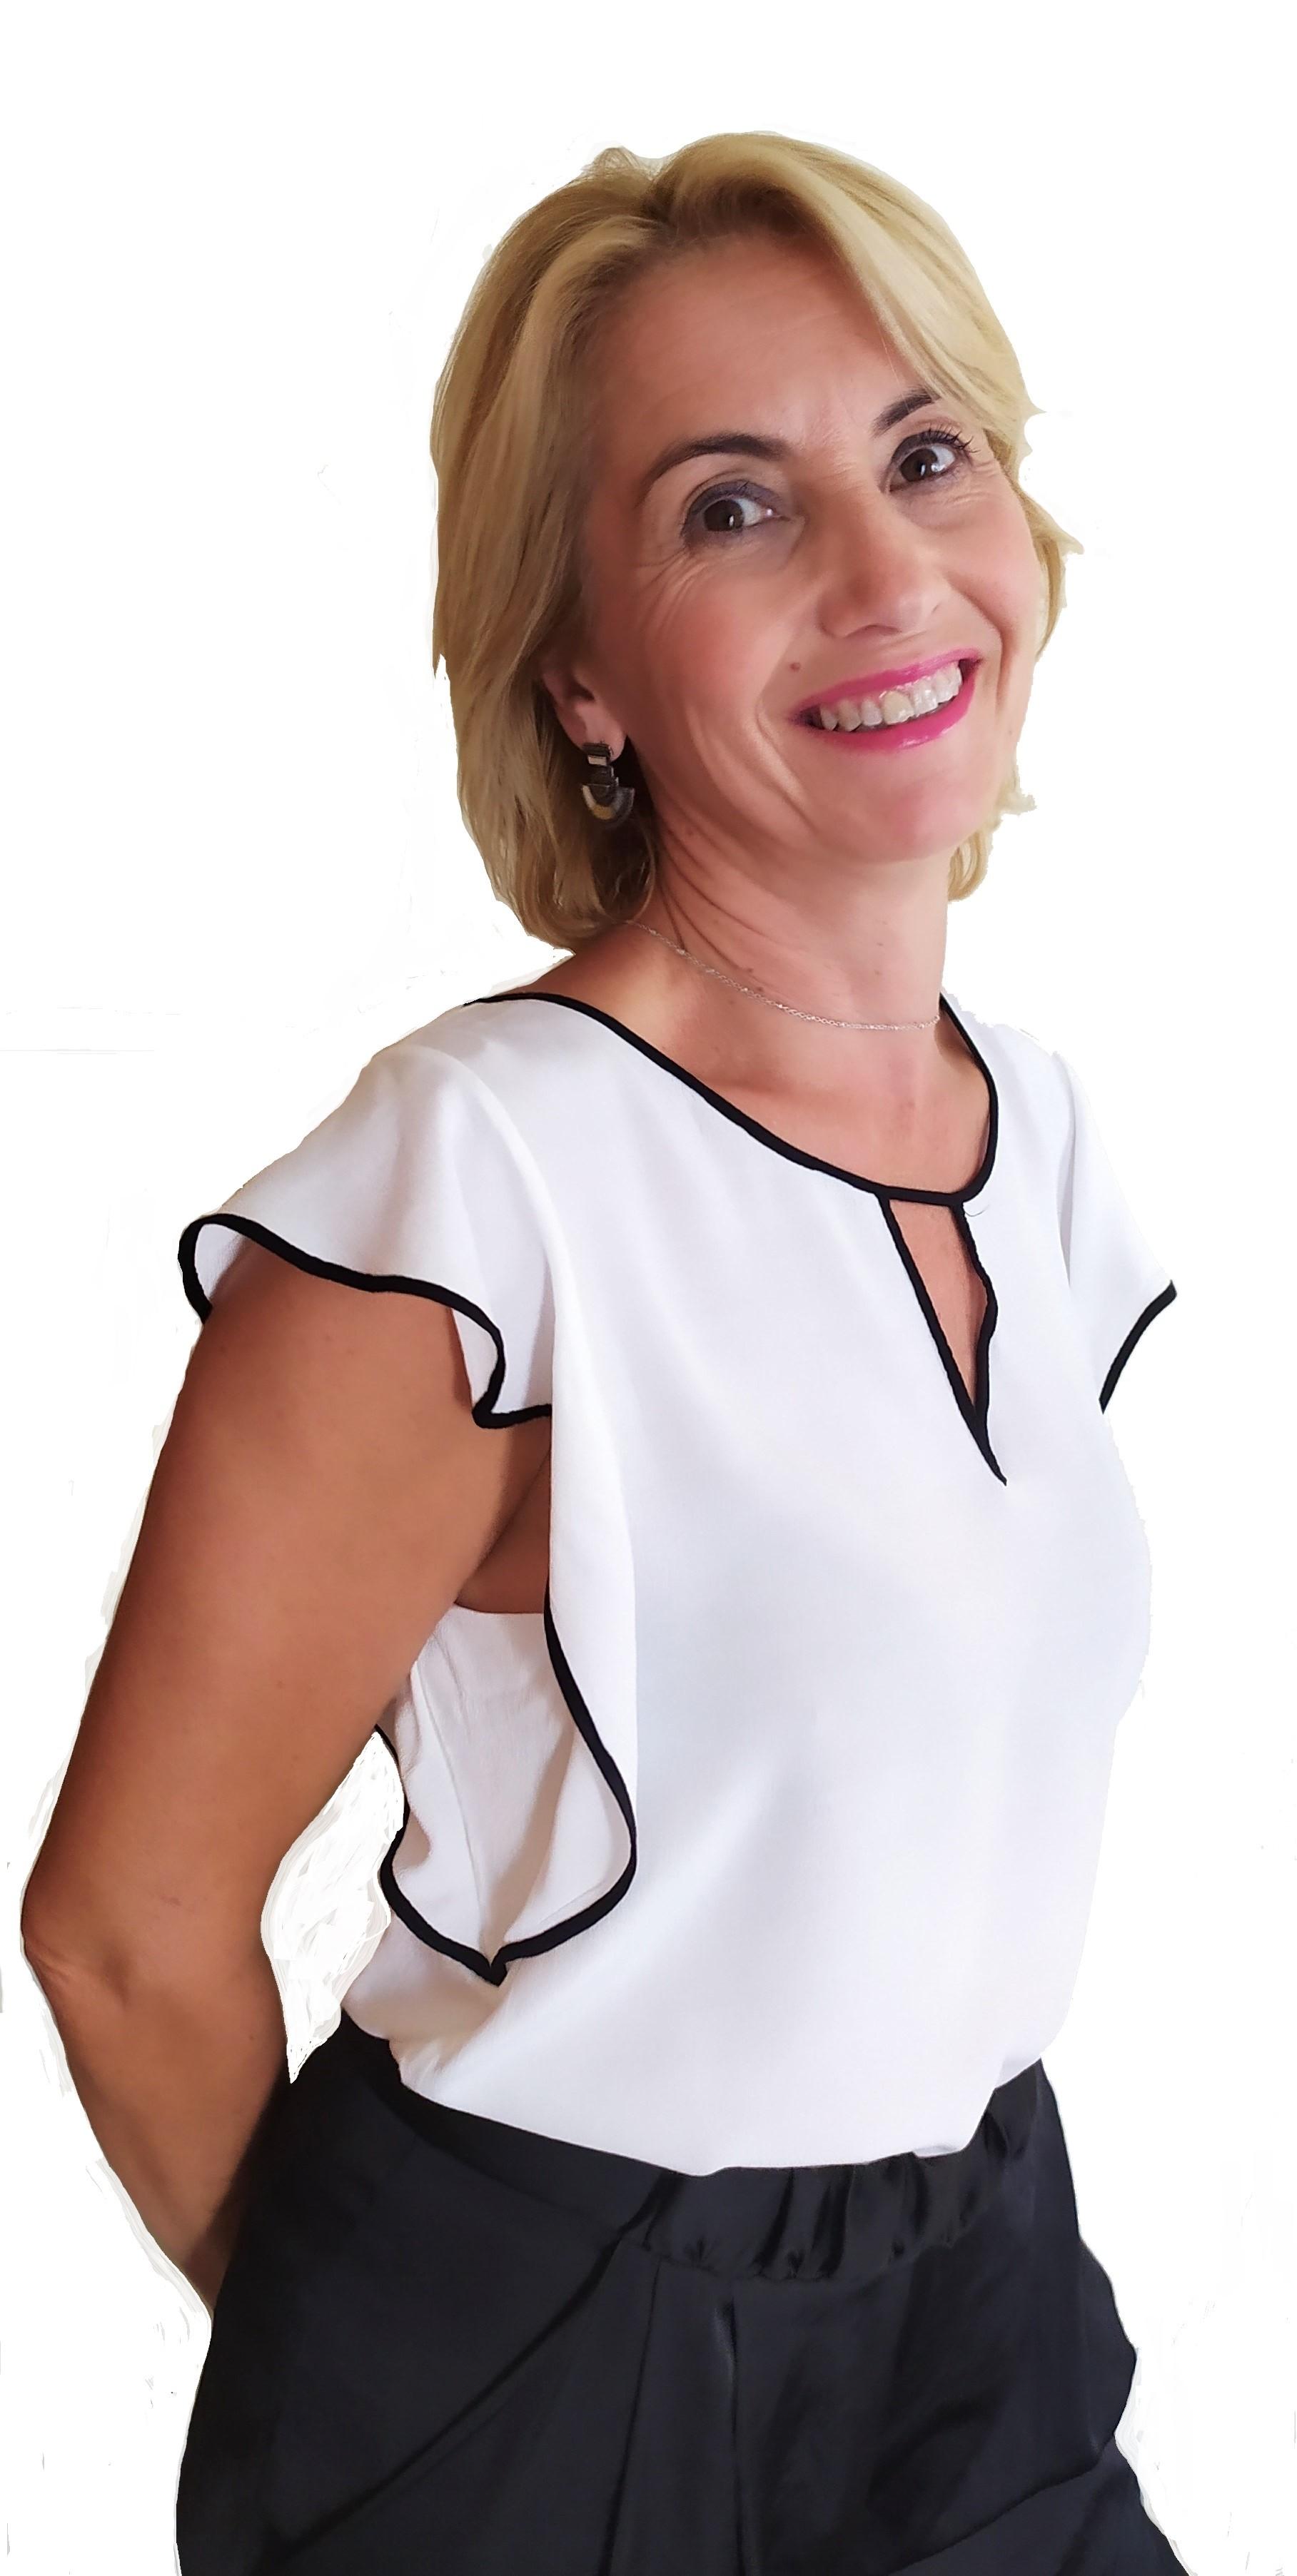 Pastora Durán De La Hera